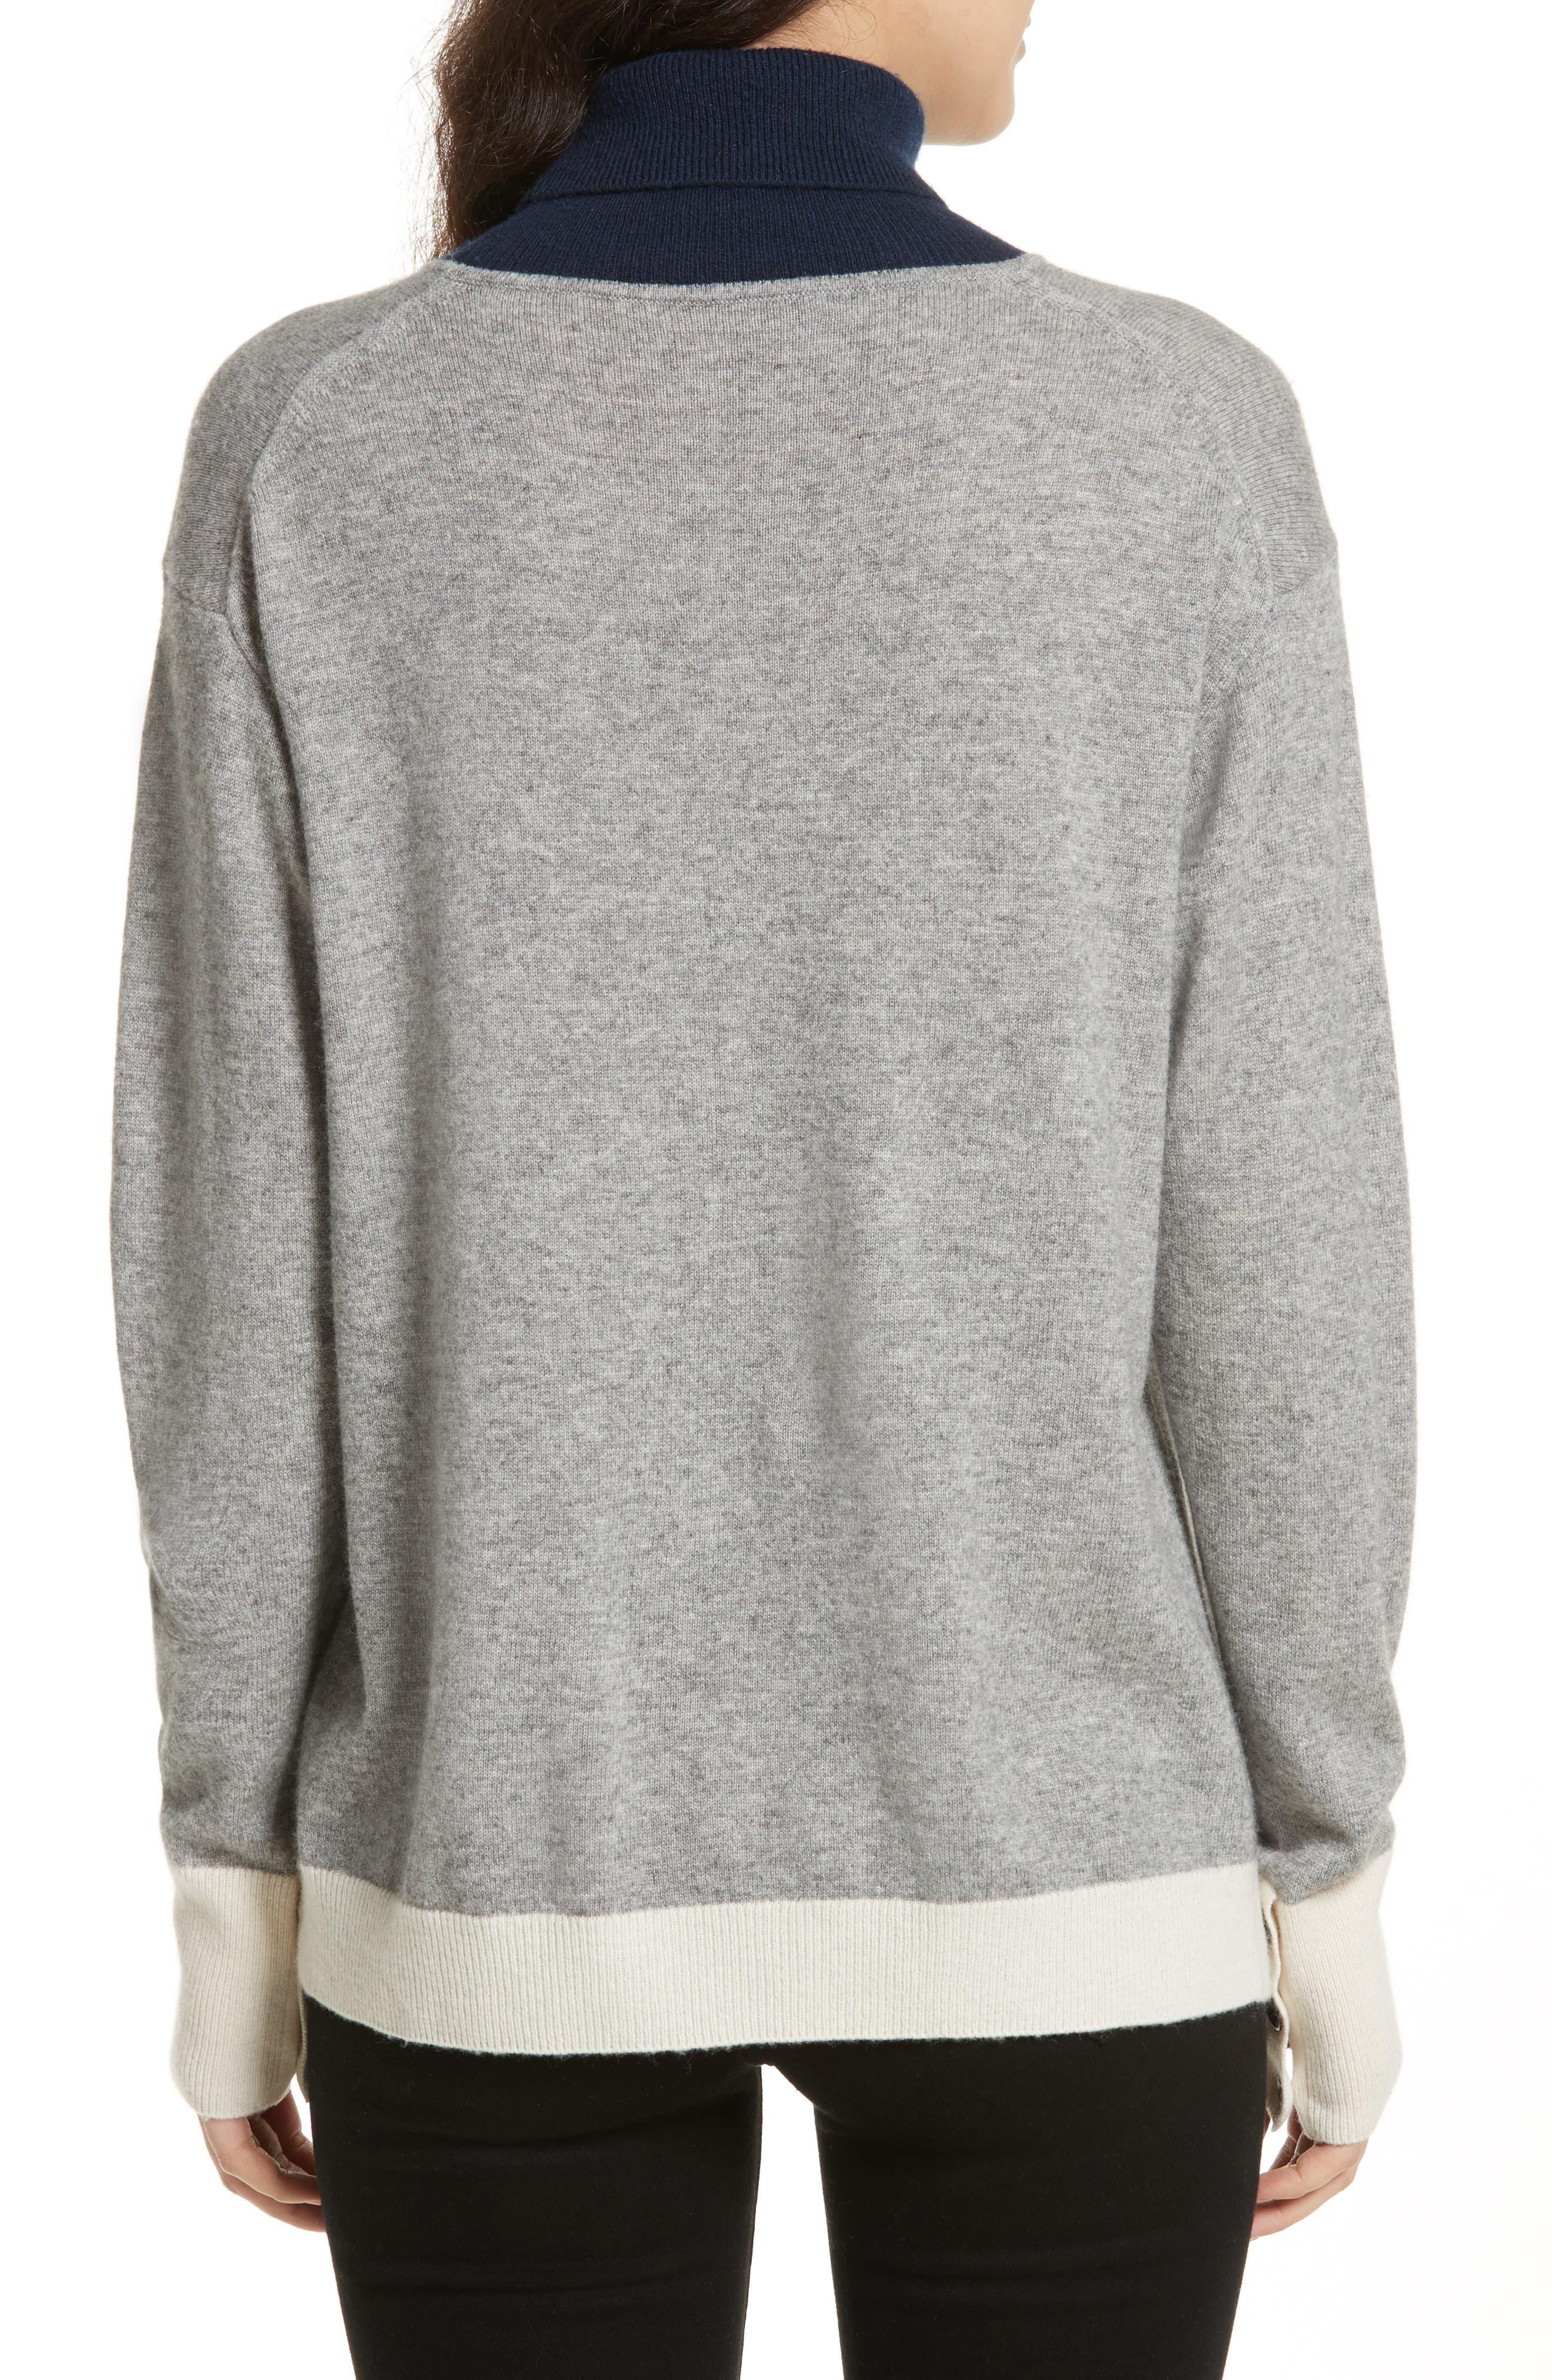 Rhea Wool & Cashmere Turtleneck Sweater,                             Alternate thumbnail 2, color,                             Grey Heather